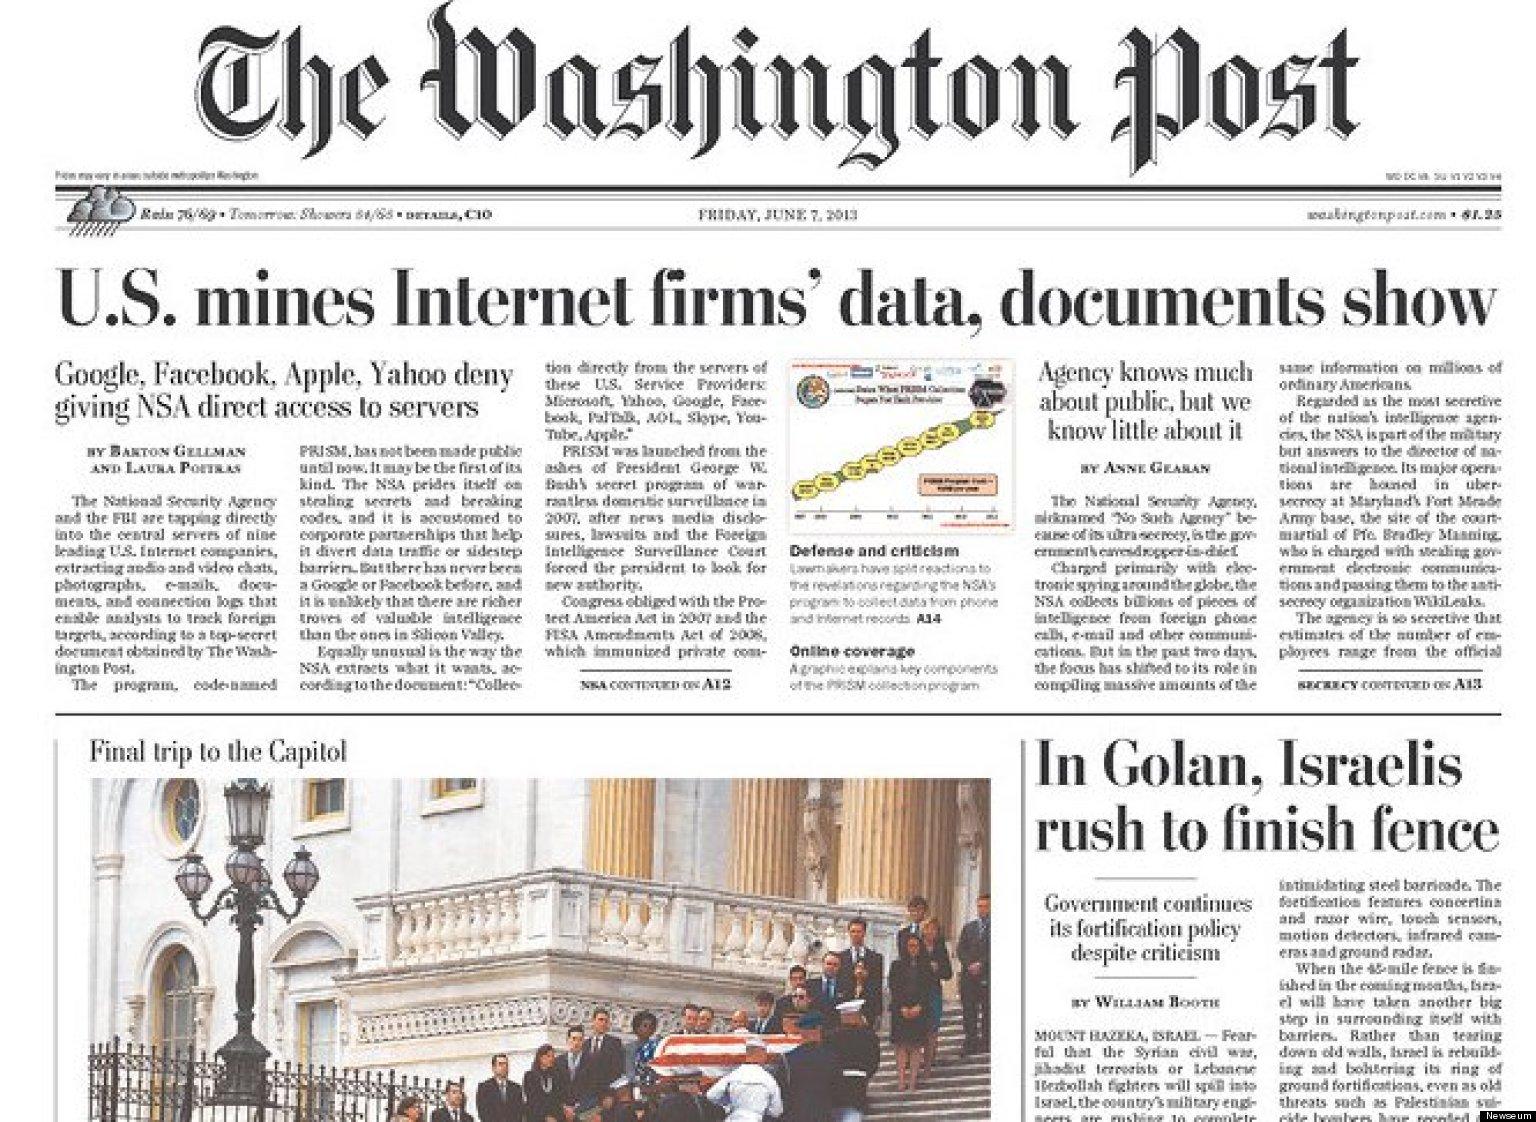 washington post began prism story three weeks ago  heard